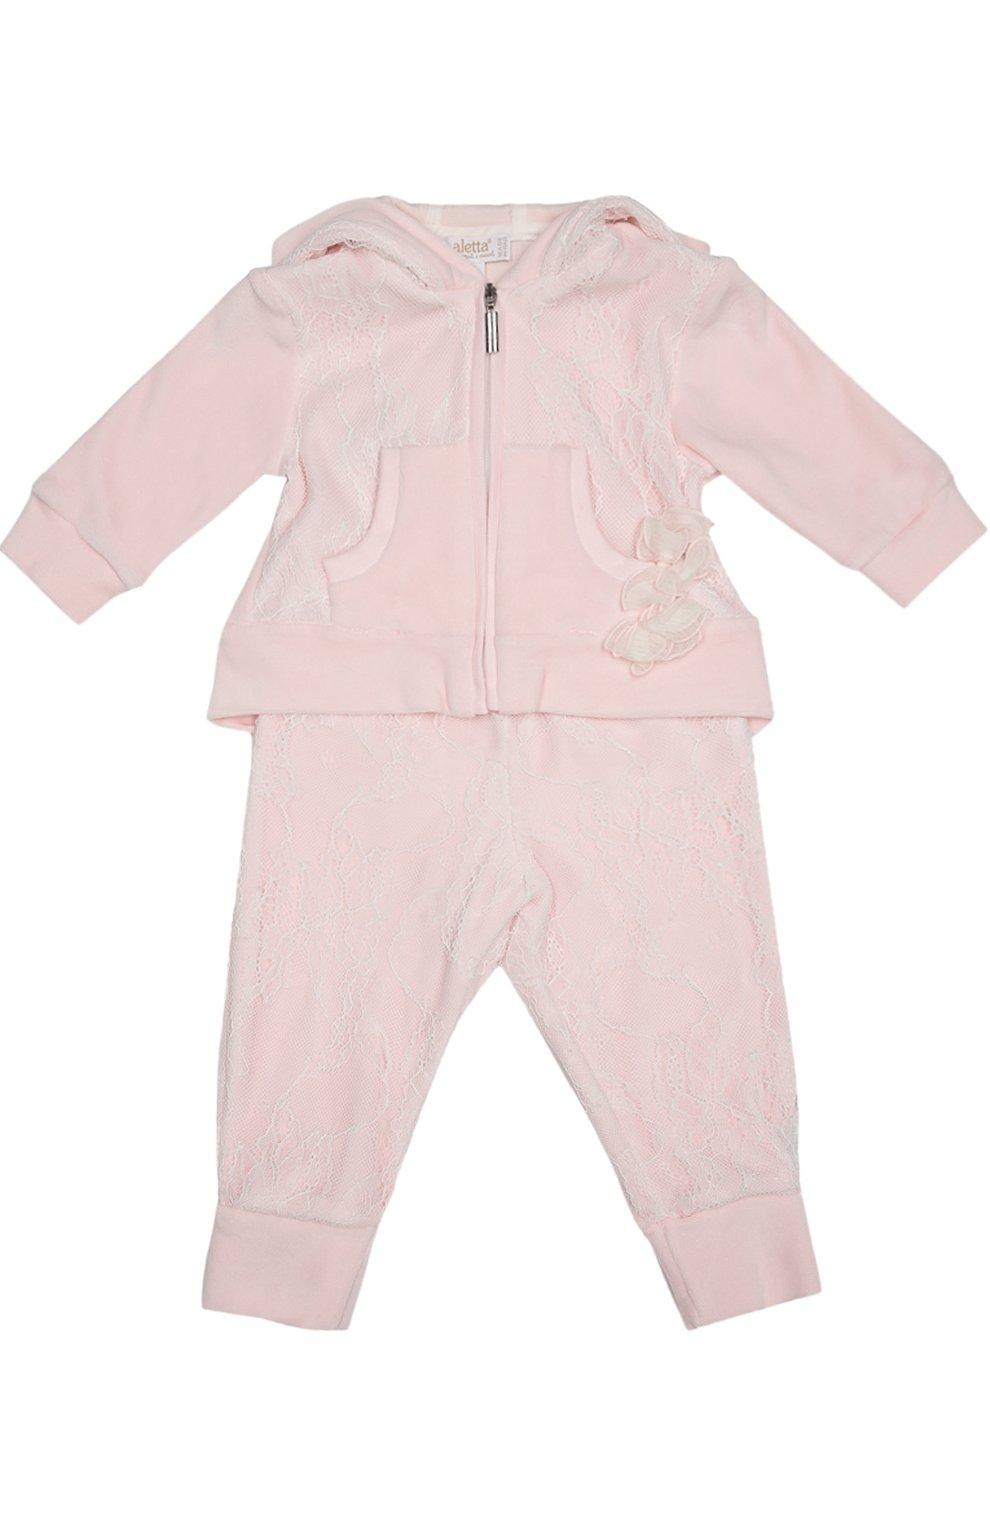 Детский костюм спортивный с футболкой  ALETTA розового цвета, арт. RP666112CIN/1M-18M | Фото 1